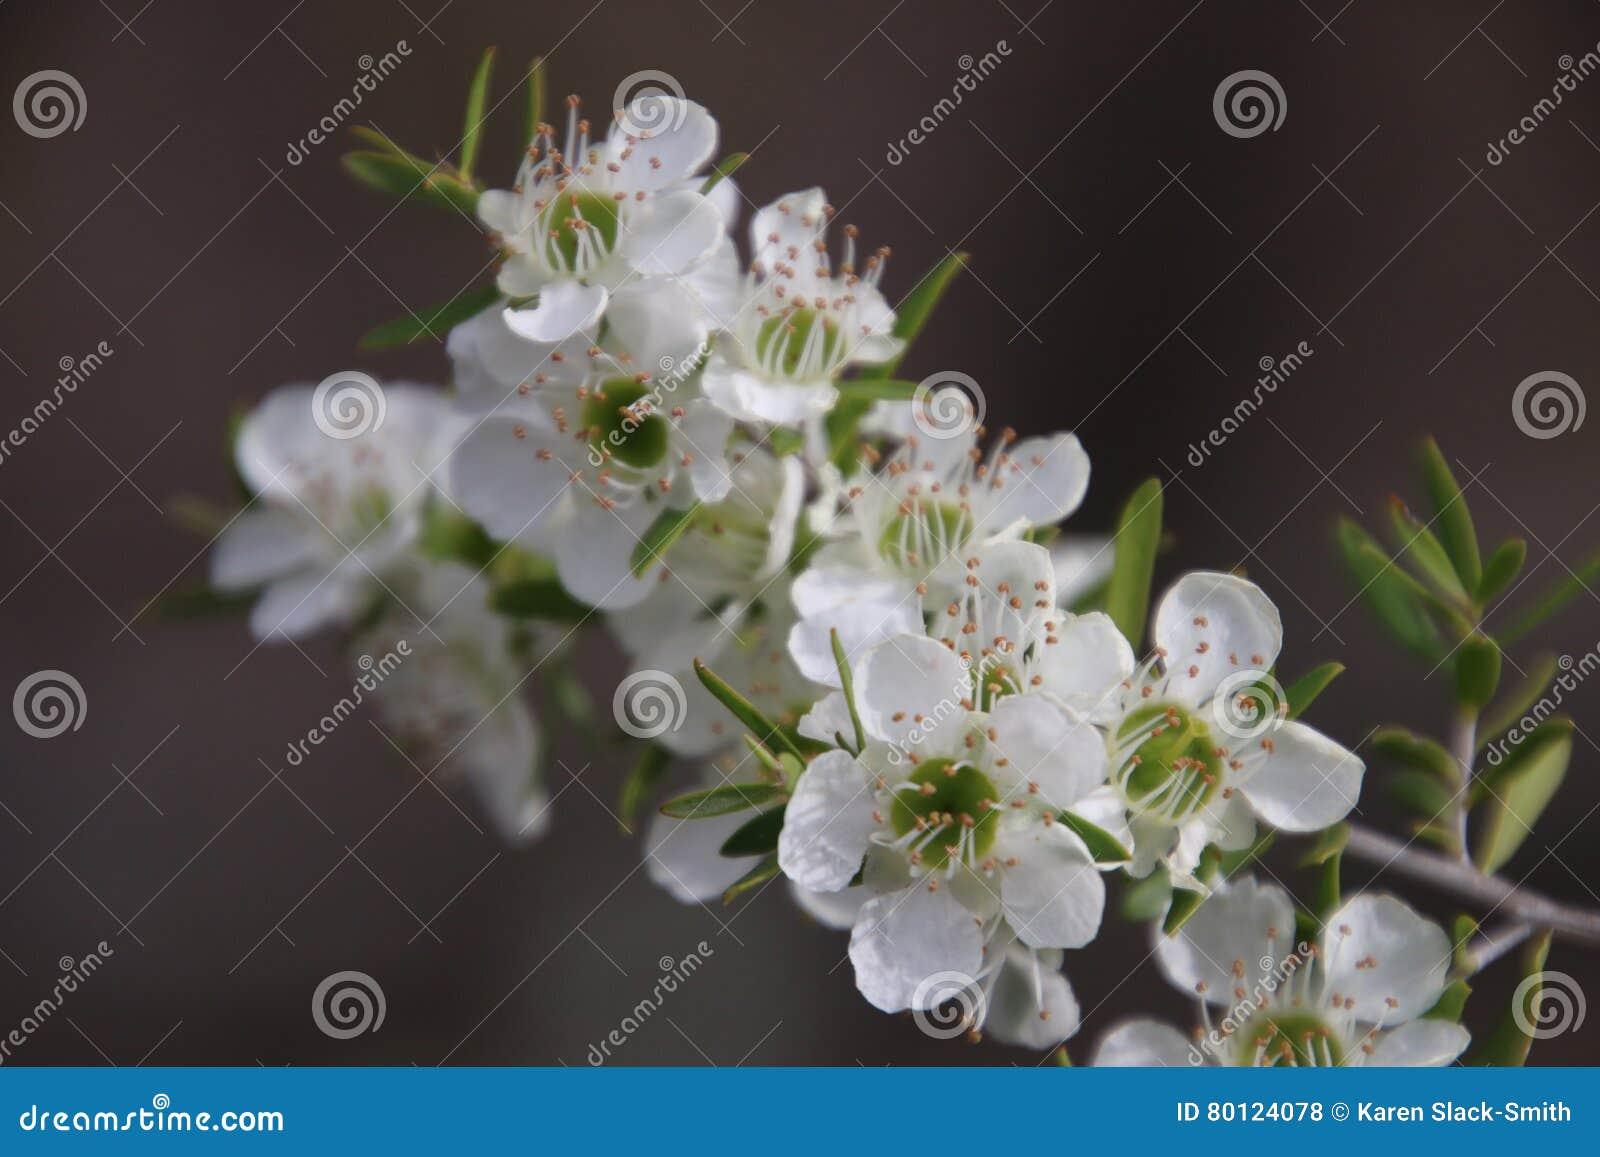 Tea Tree White Flowers Stock Photo Image Of Cardwell 80124078